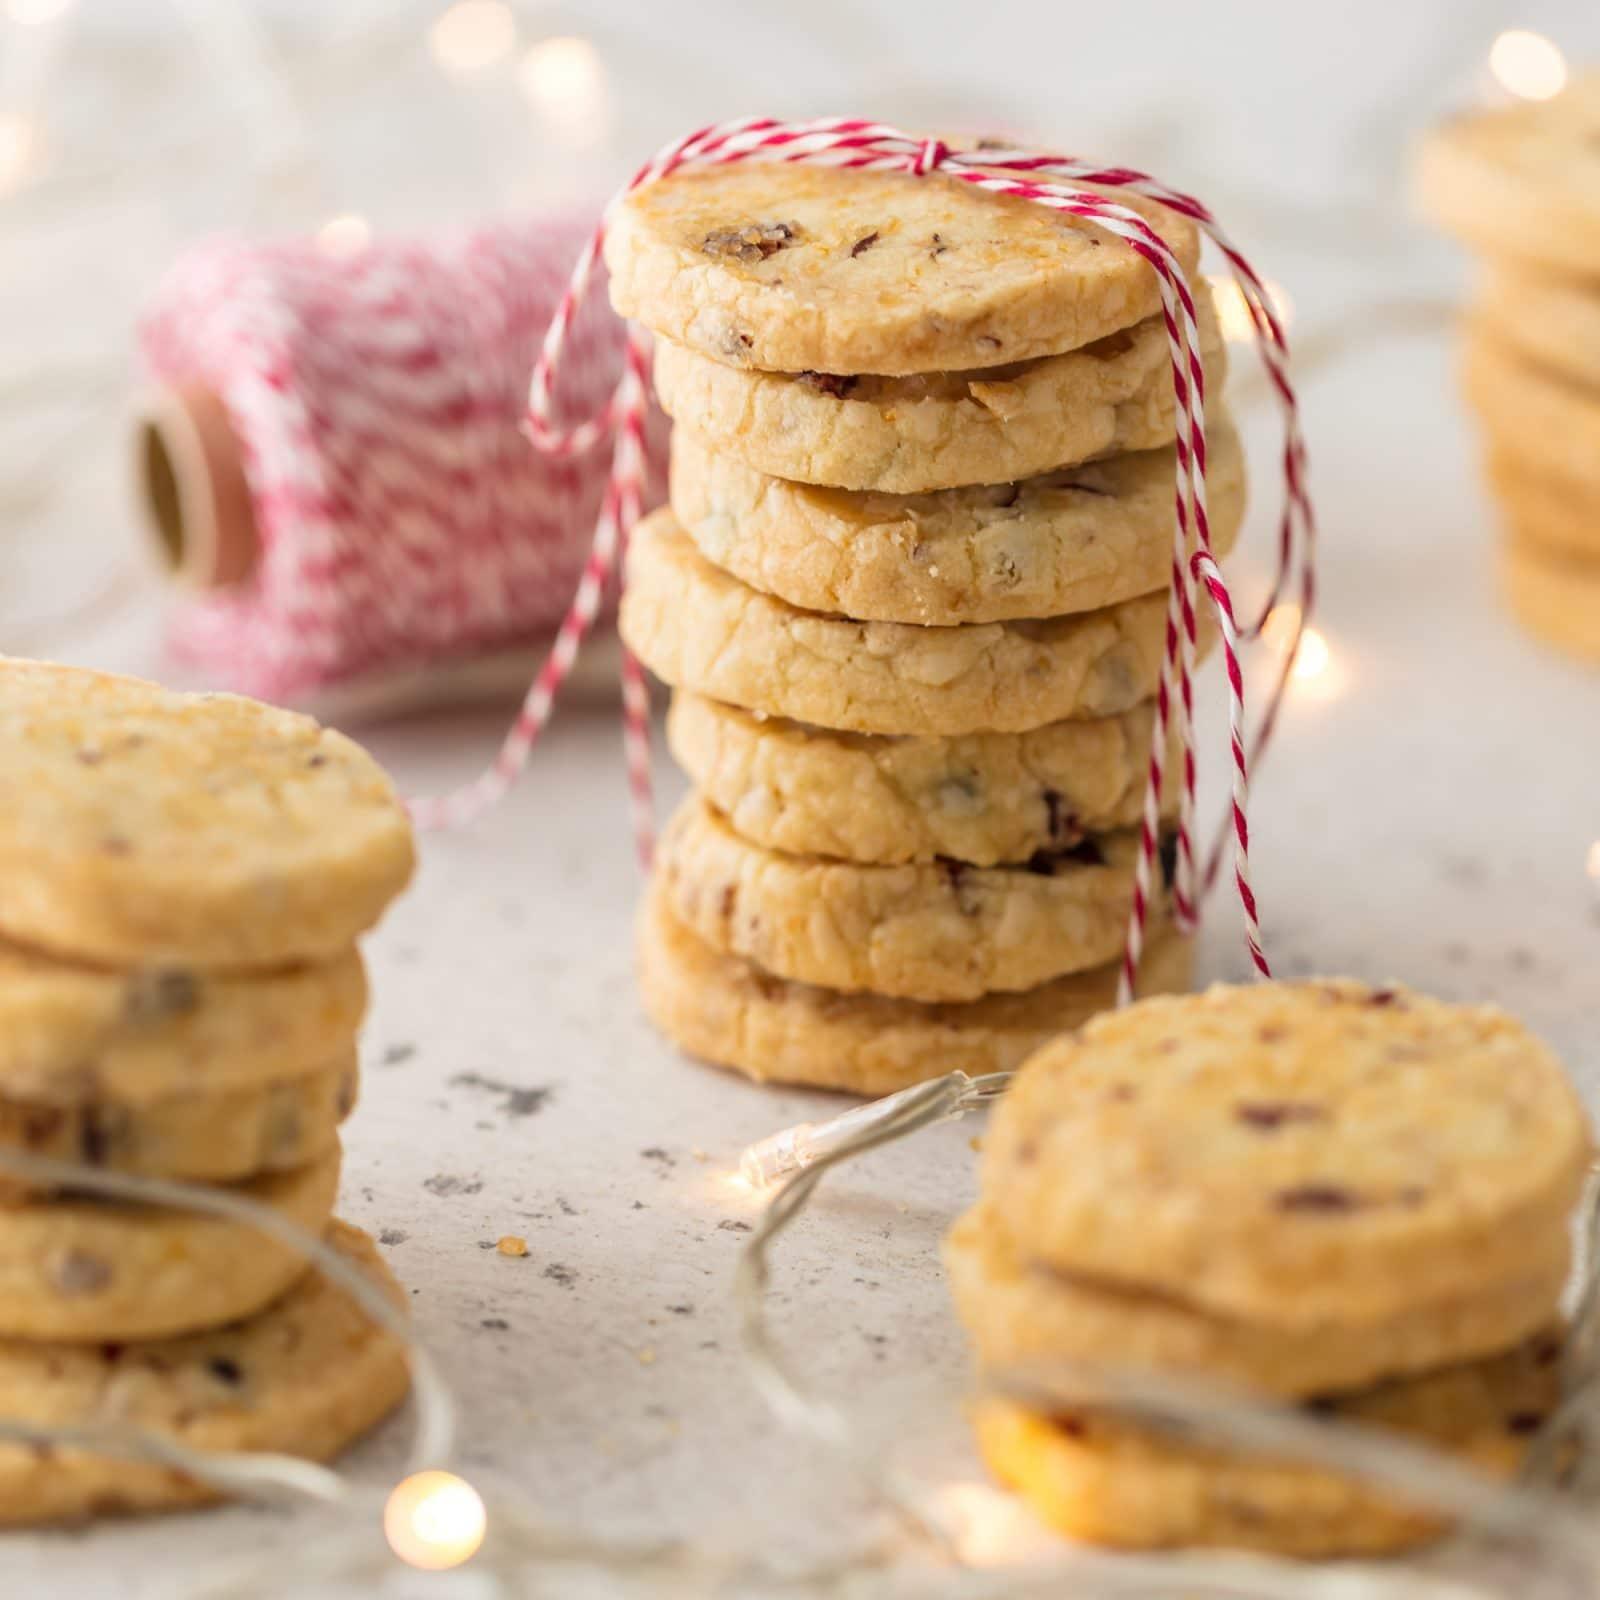 Best Orange Almond Biscuit / Cookie Recipe